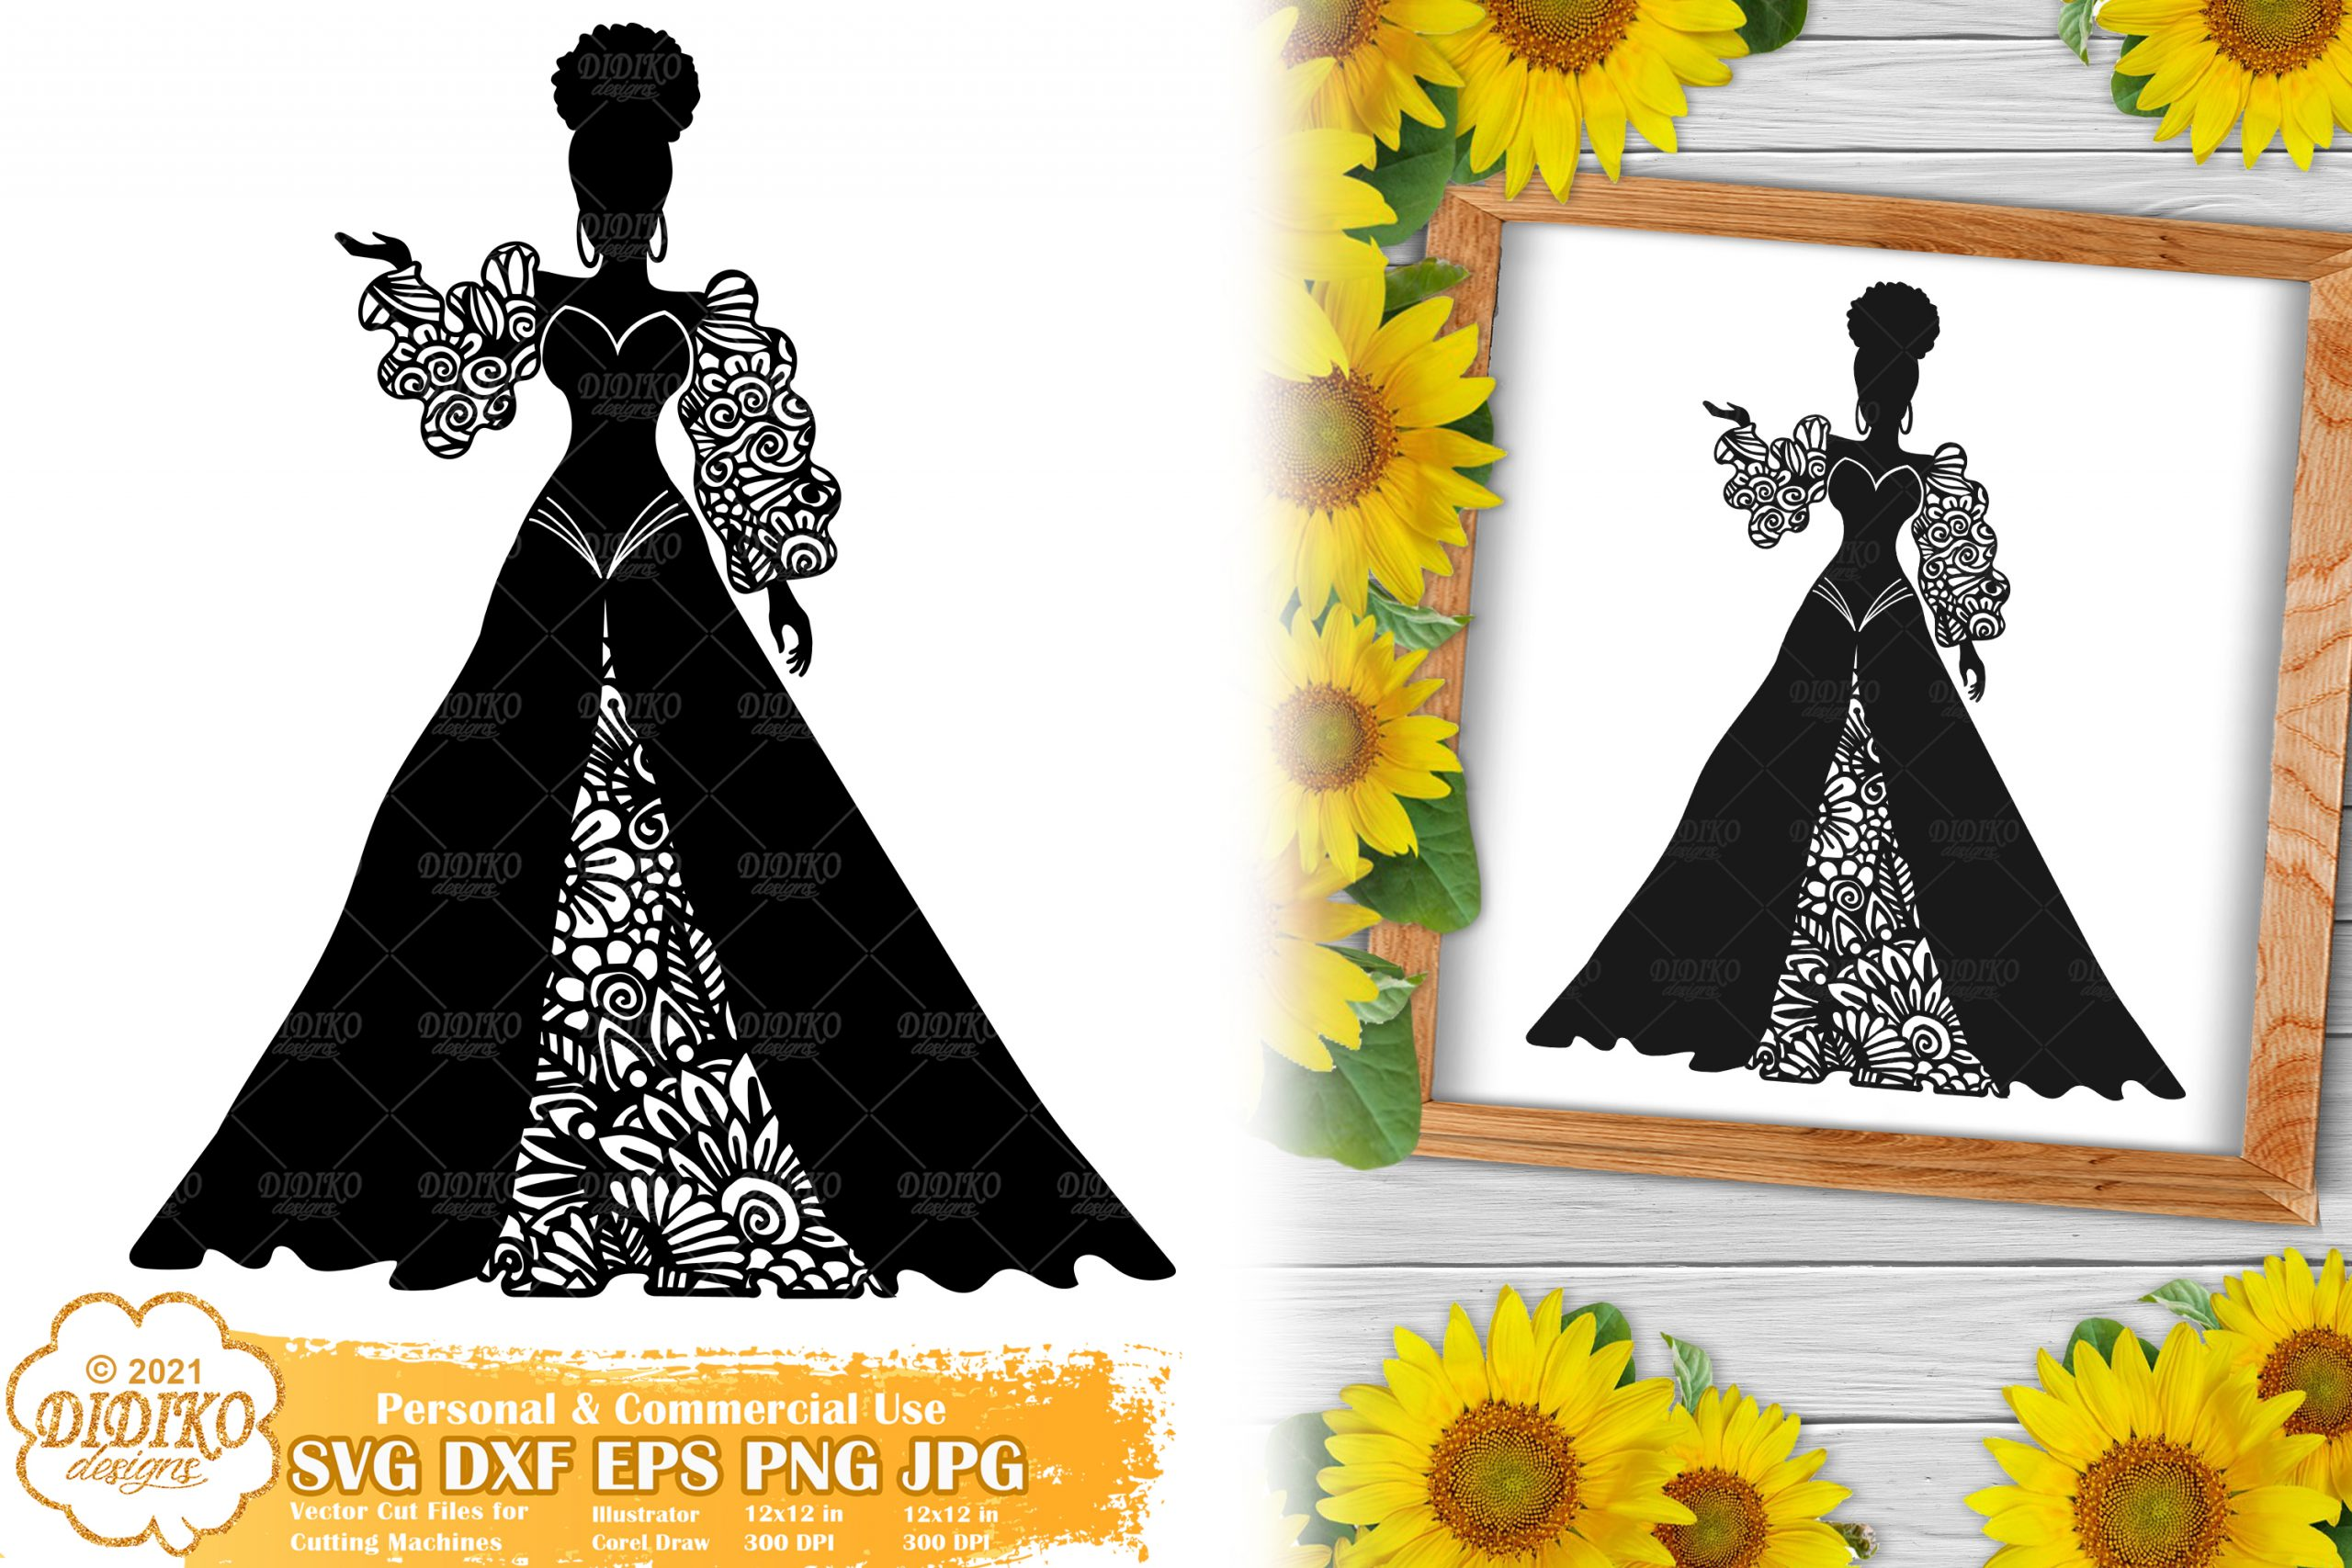 Zentangle Woman SVG #1